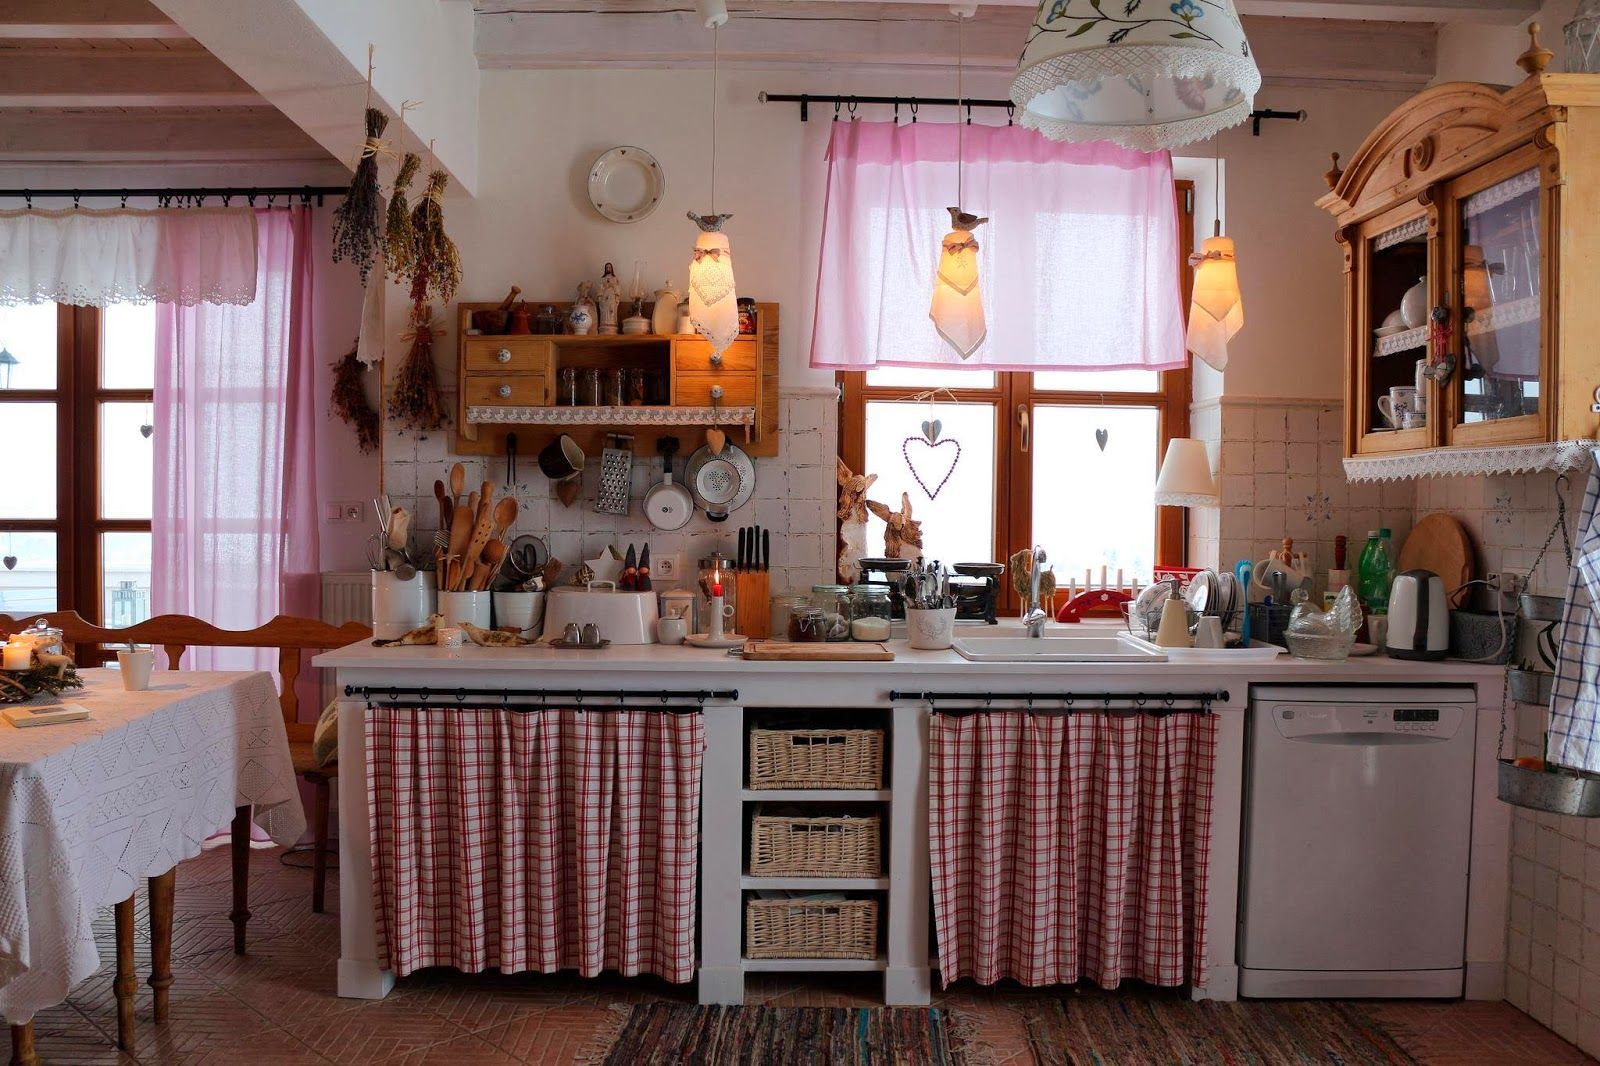 Cocina antigua cocinas tradicionales pinterest Cocinas antiguas